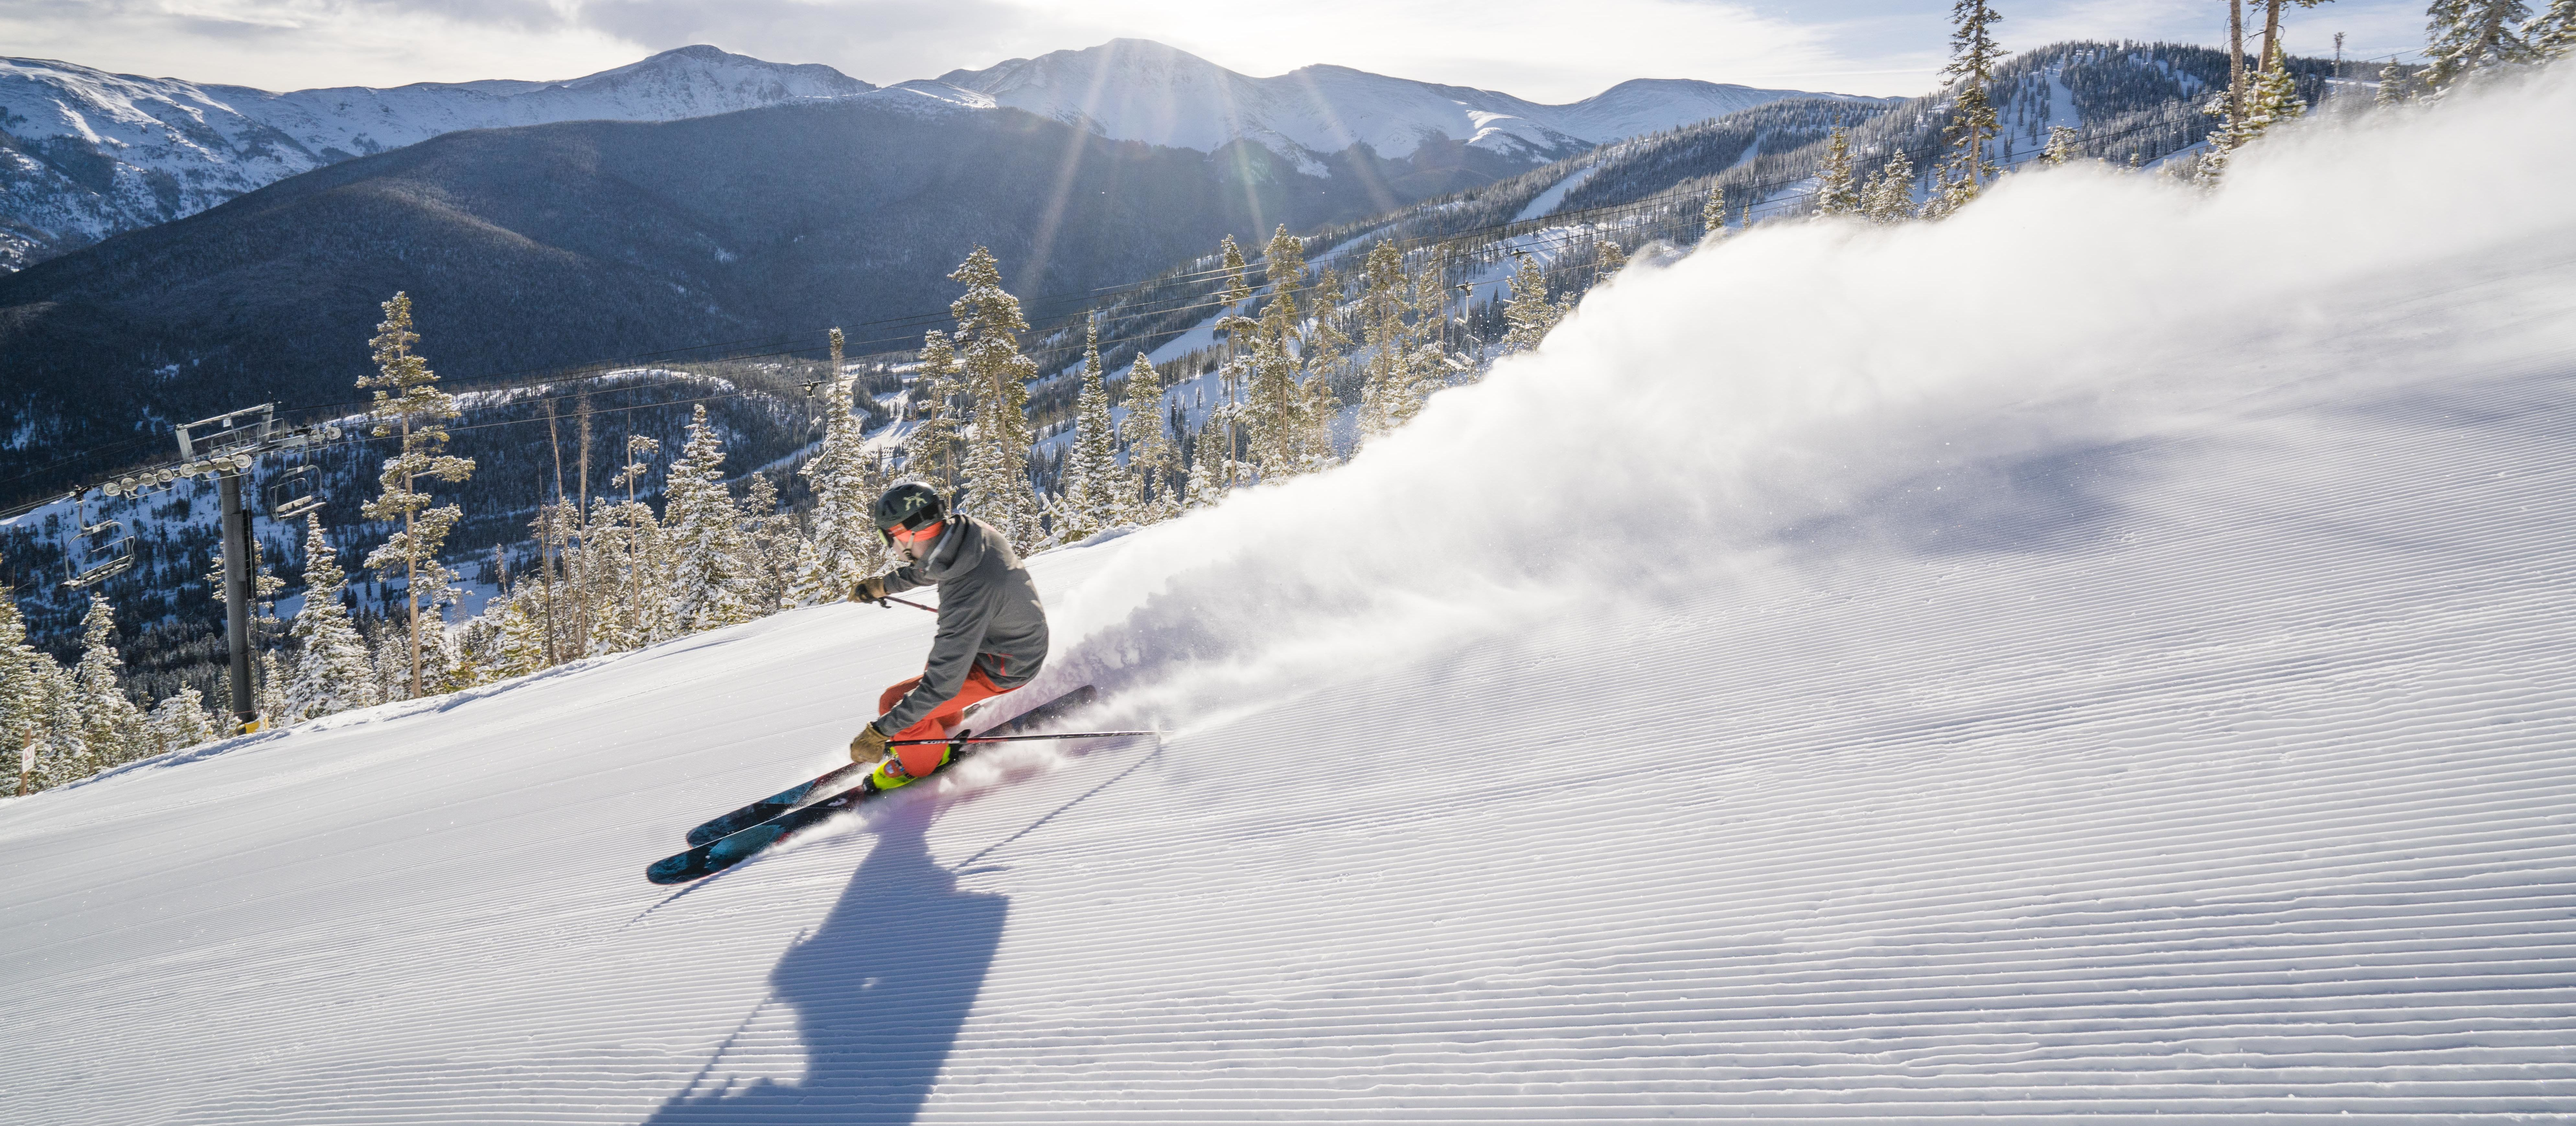 Skifahren im Winter Park Resort im US-Bundesstaat Colorado